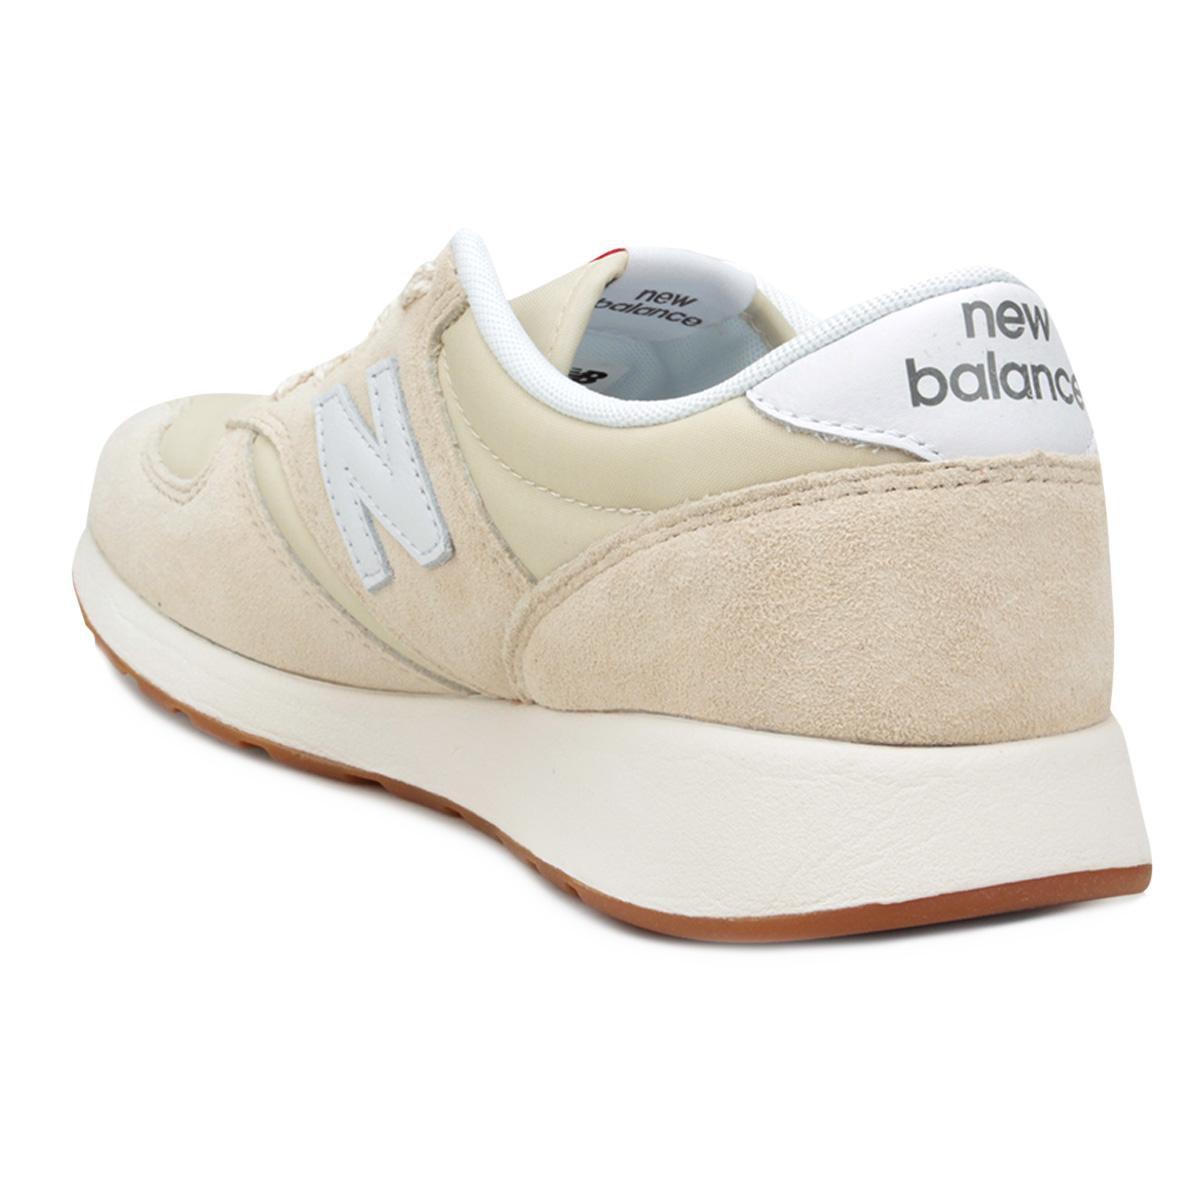 542d3ab3bc2 ... Foto 3 - Tênis Couro New Balance 420 Feminino ...